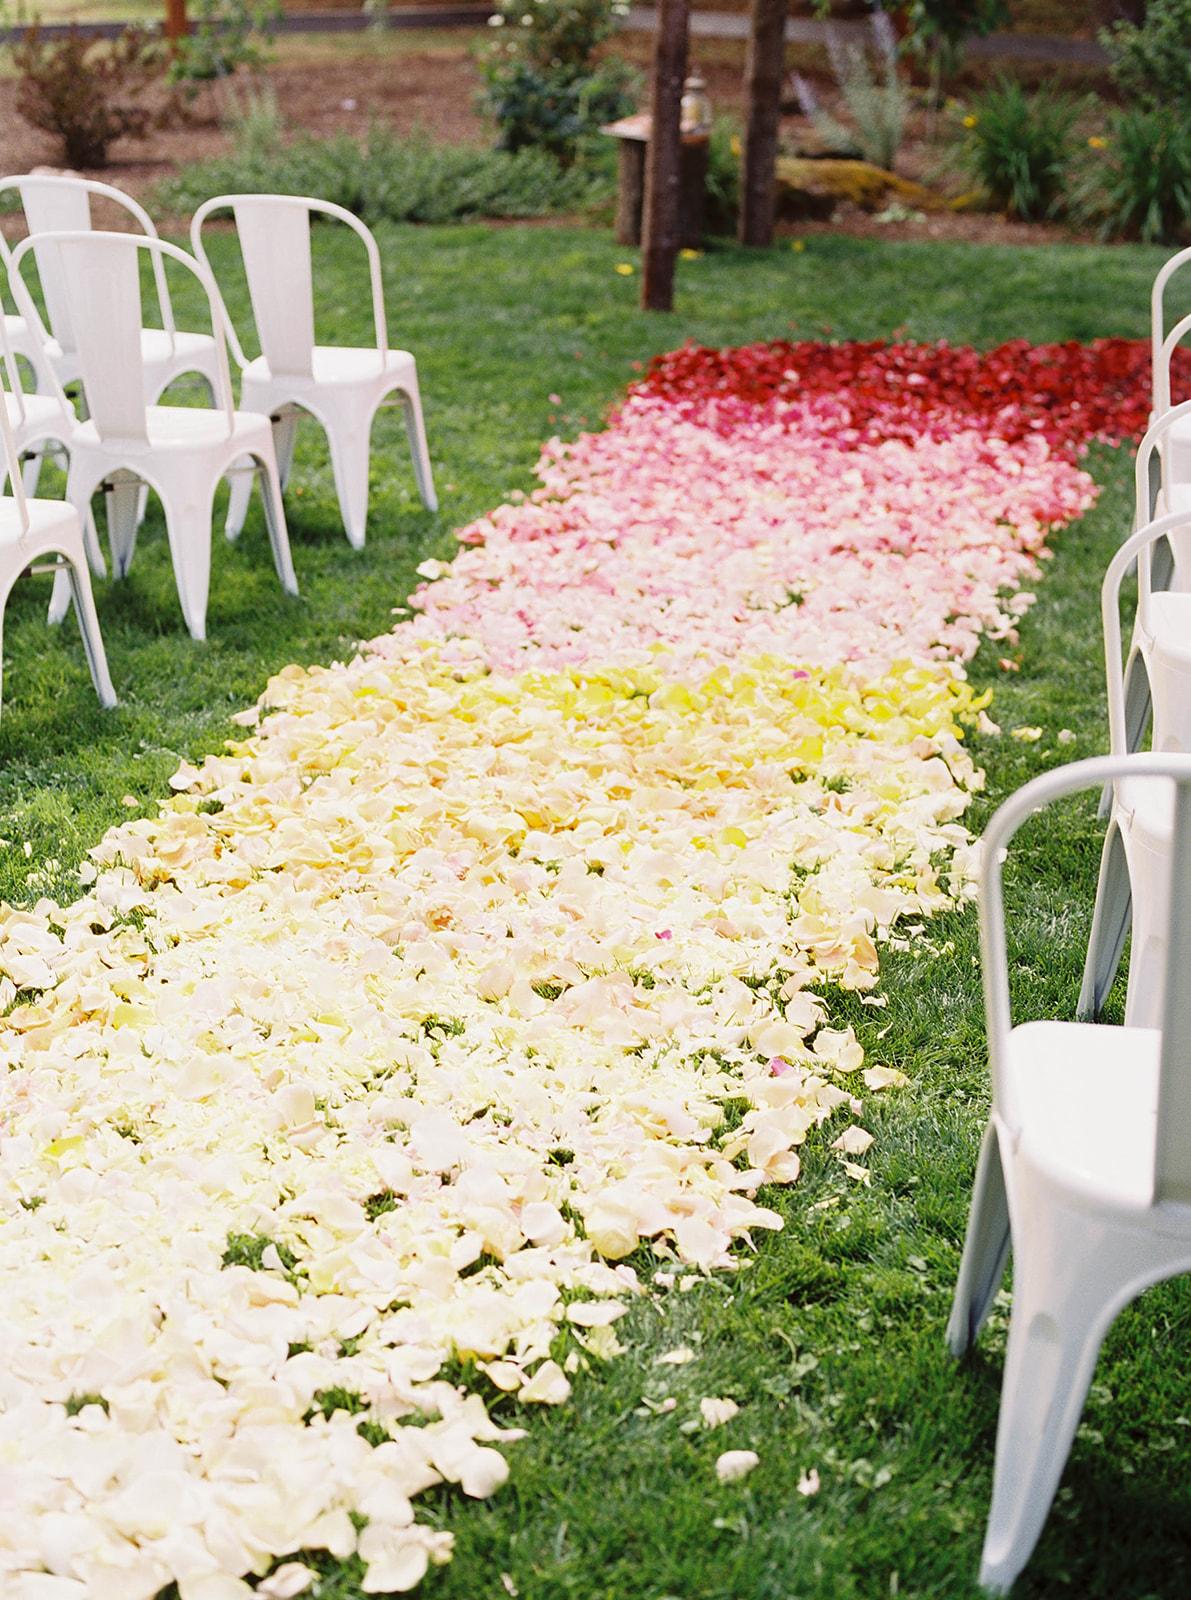 justin kevin wedding colorful rainbow aisle runner